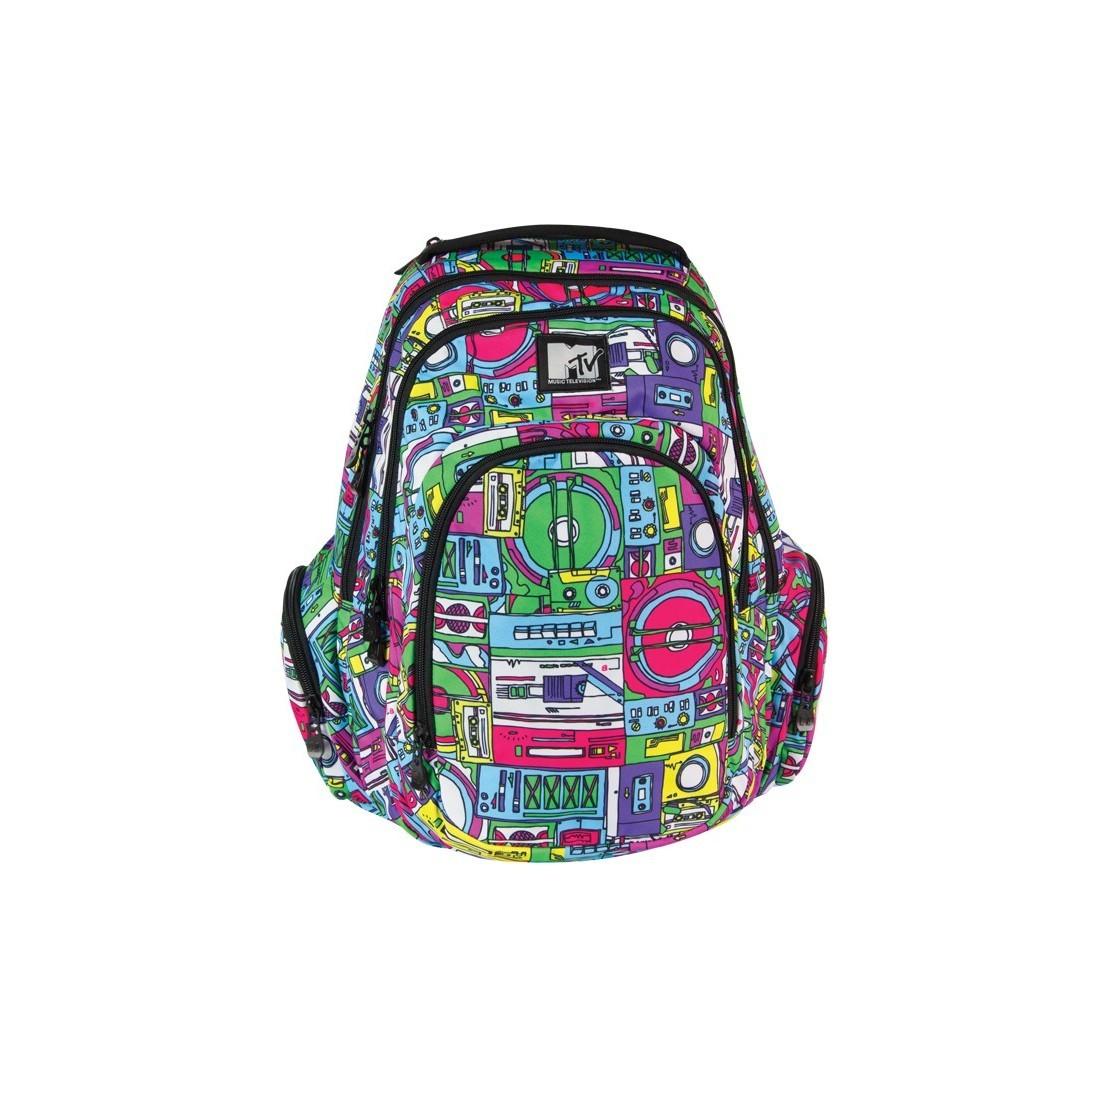 Plecak młodzieżowy duży MTV Coolpack Music - plecak-tornister.pl